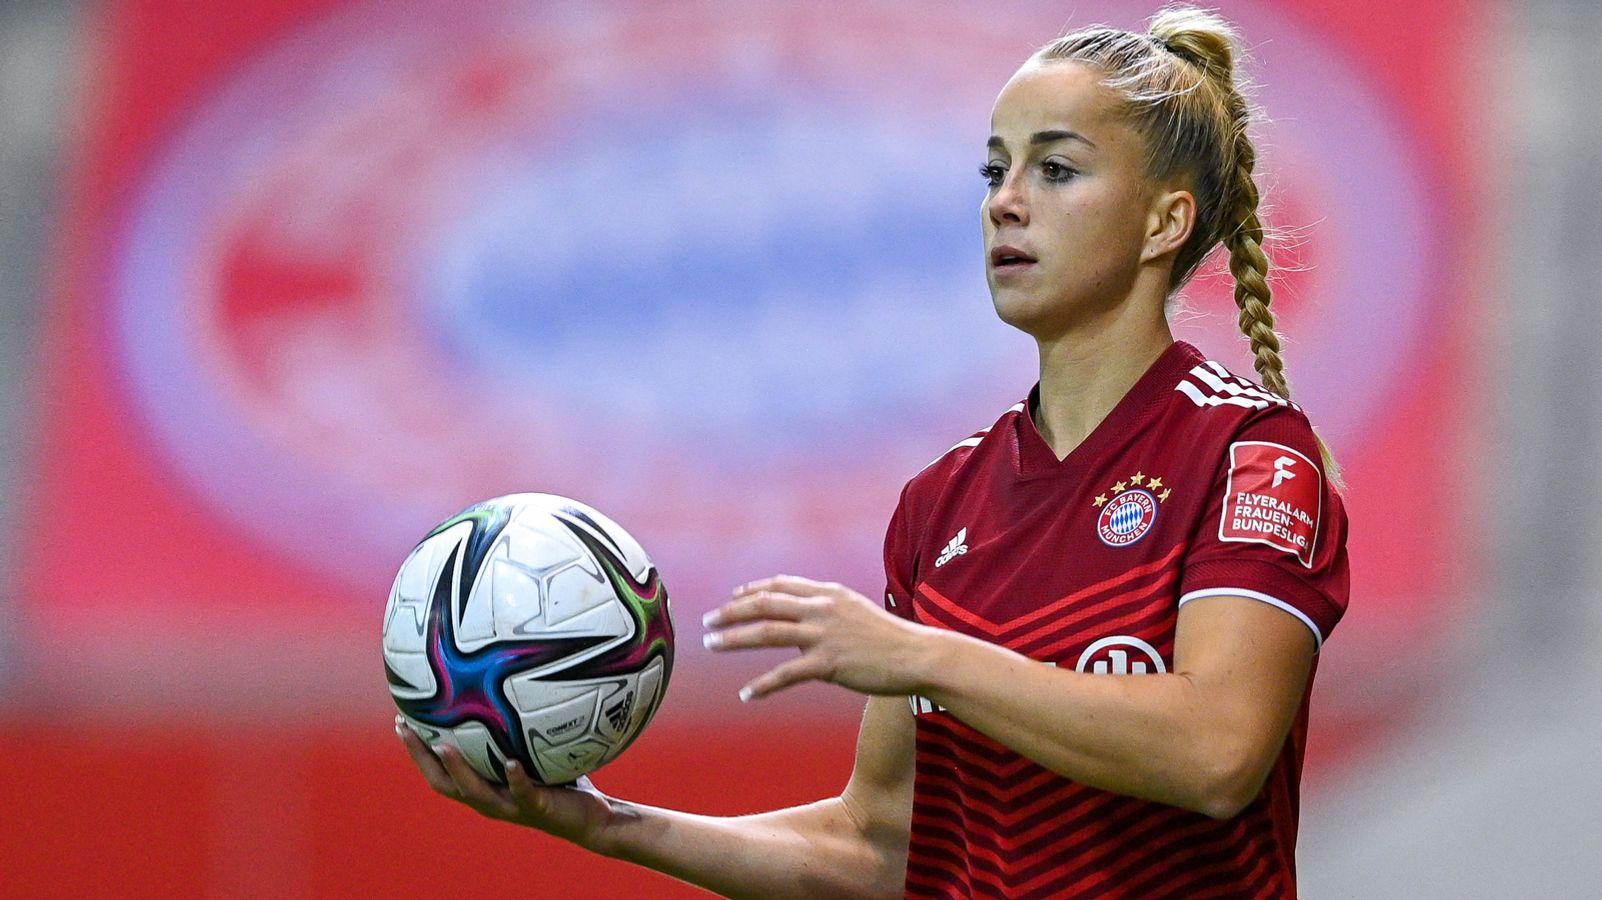 DFB Women: Julia Gwen returns to World Cup qualifiers